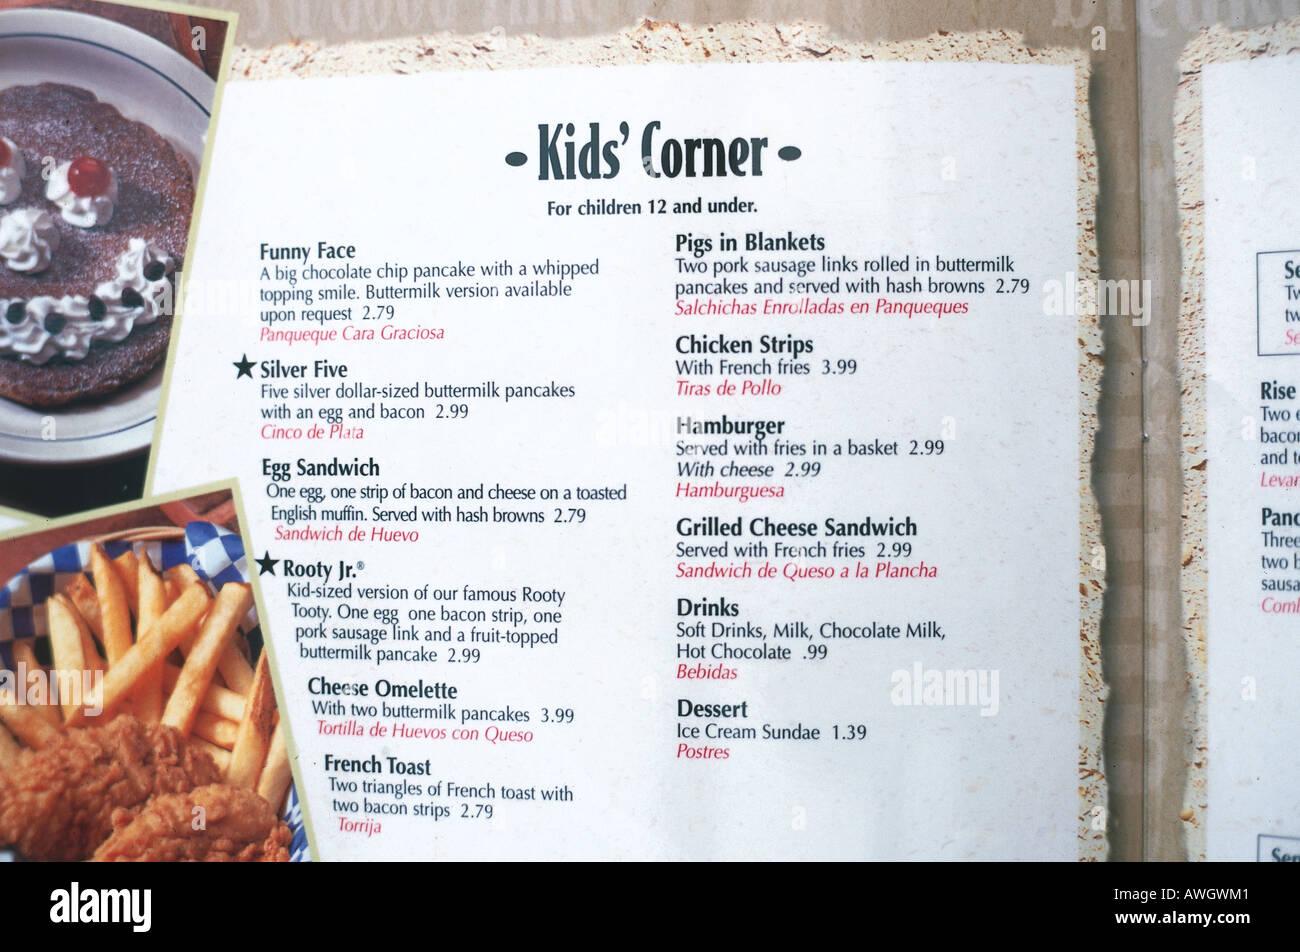 USA, Florida, Orlando, Kid's Corner children's food menu, close-up - Stock Image